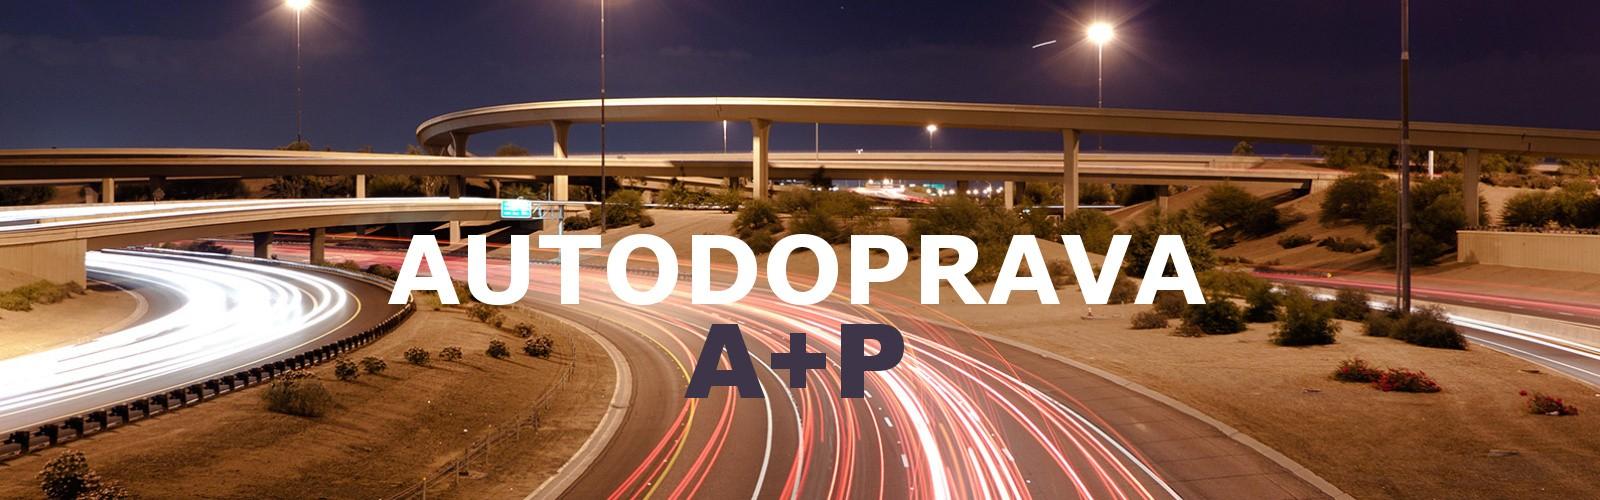 AUTODOPRAVA A+P